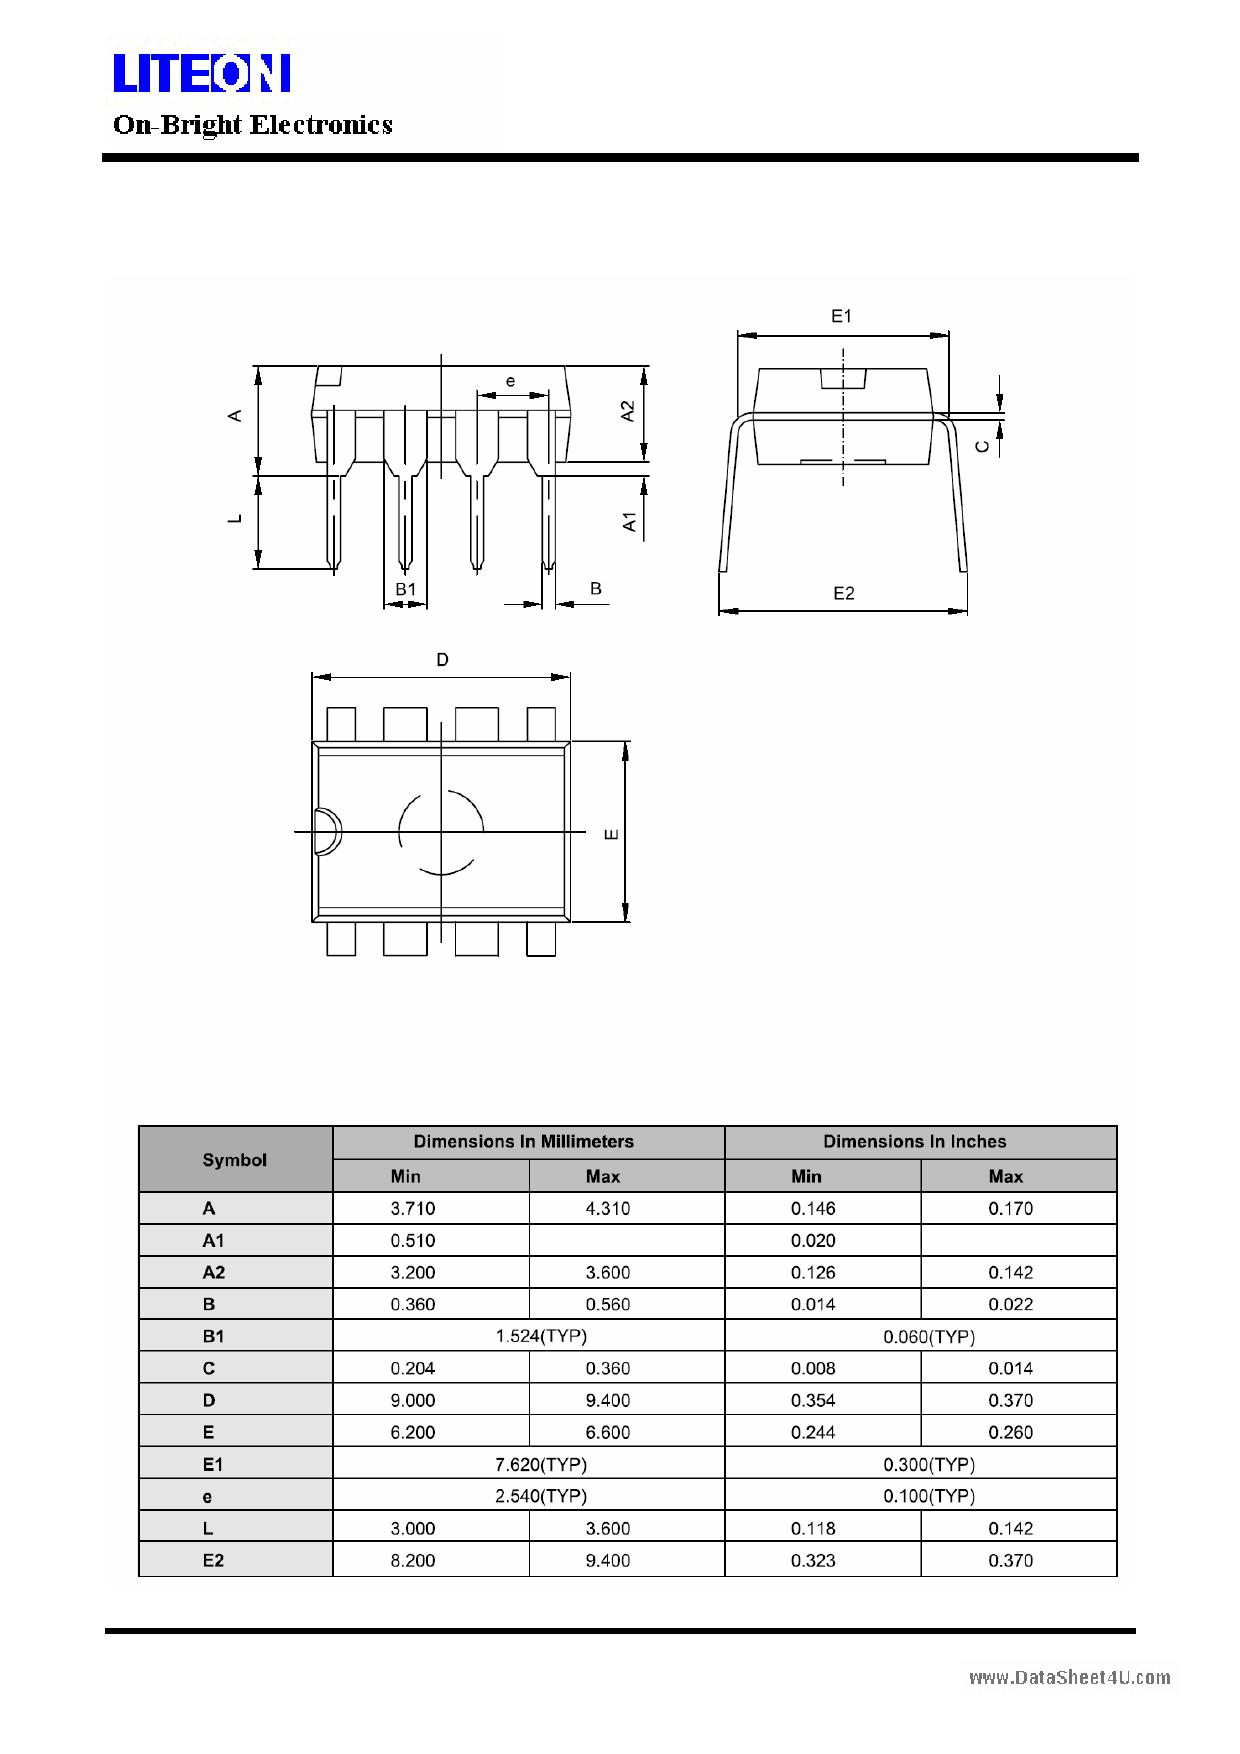 OB2268 arduino